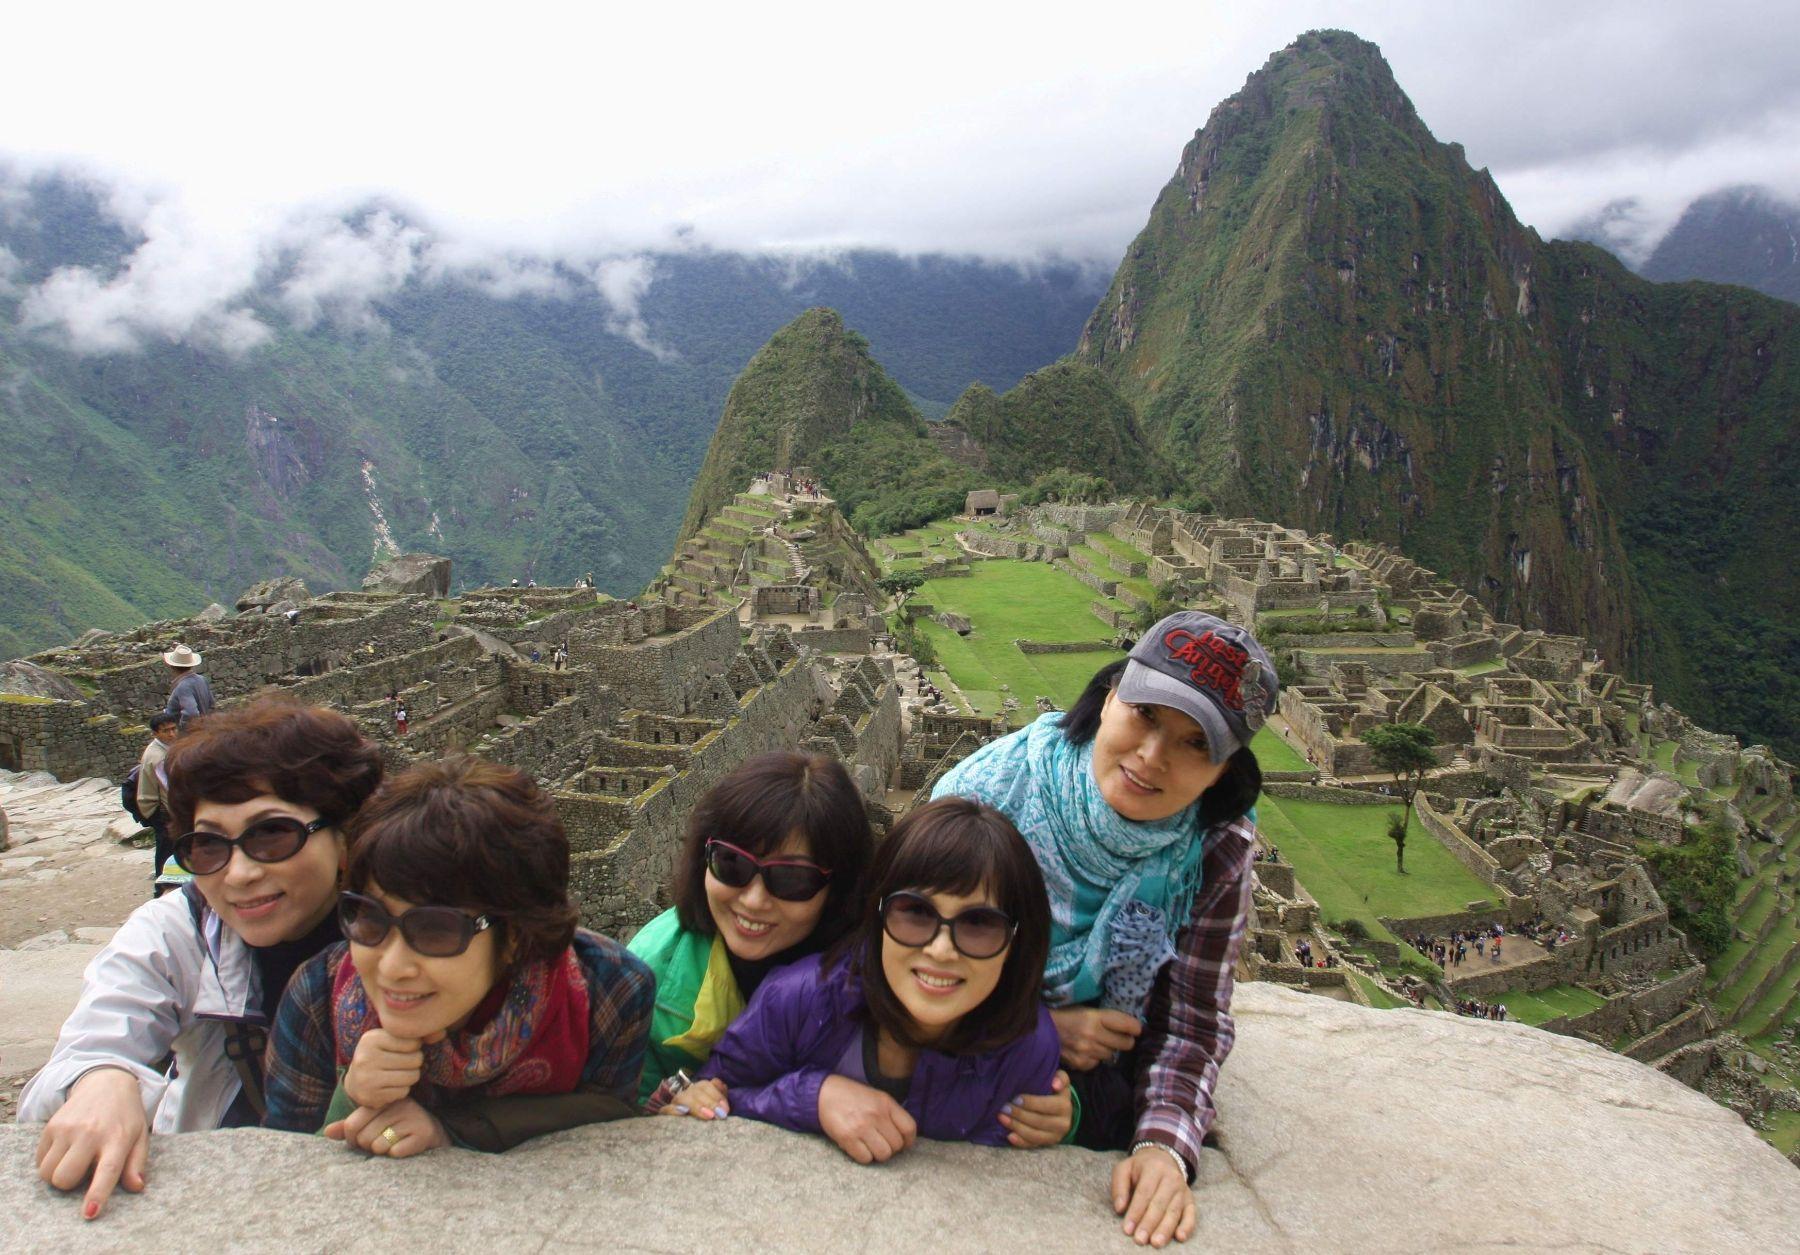 Turistas en Machu Picchu. Foto: ANDINA/archivo.